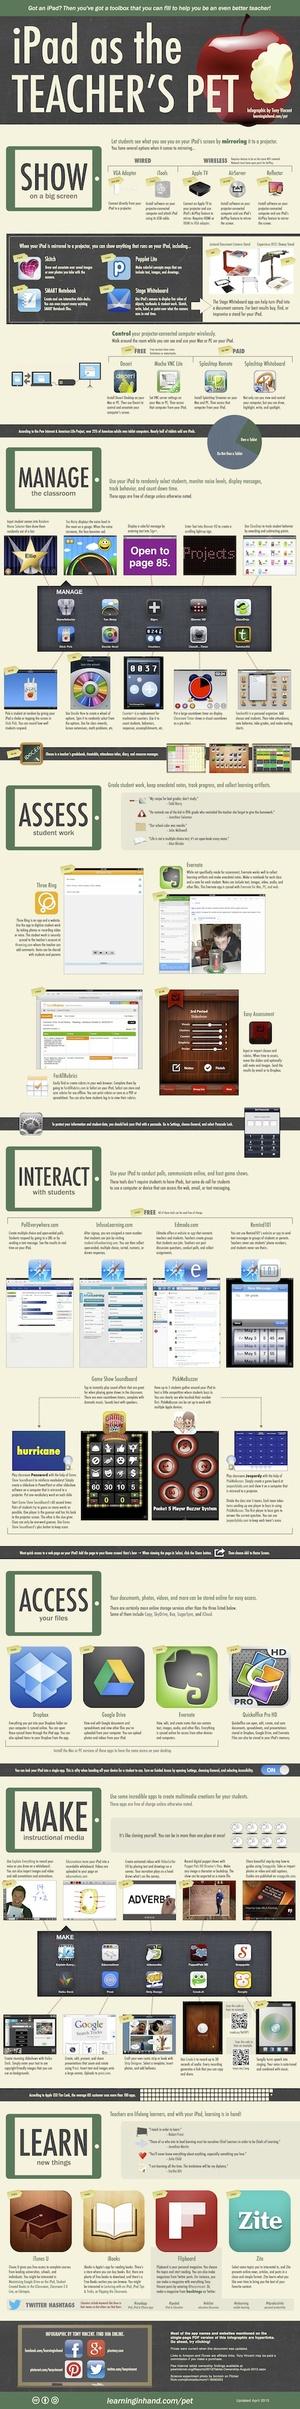 iPad as Teacher's Pet